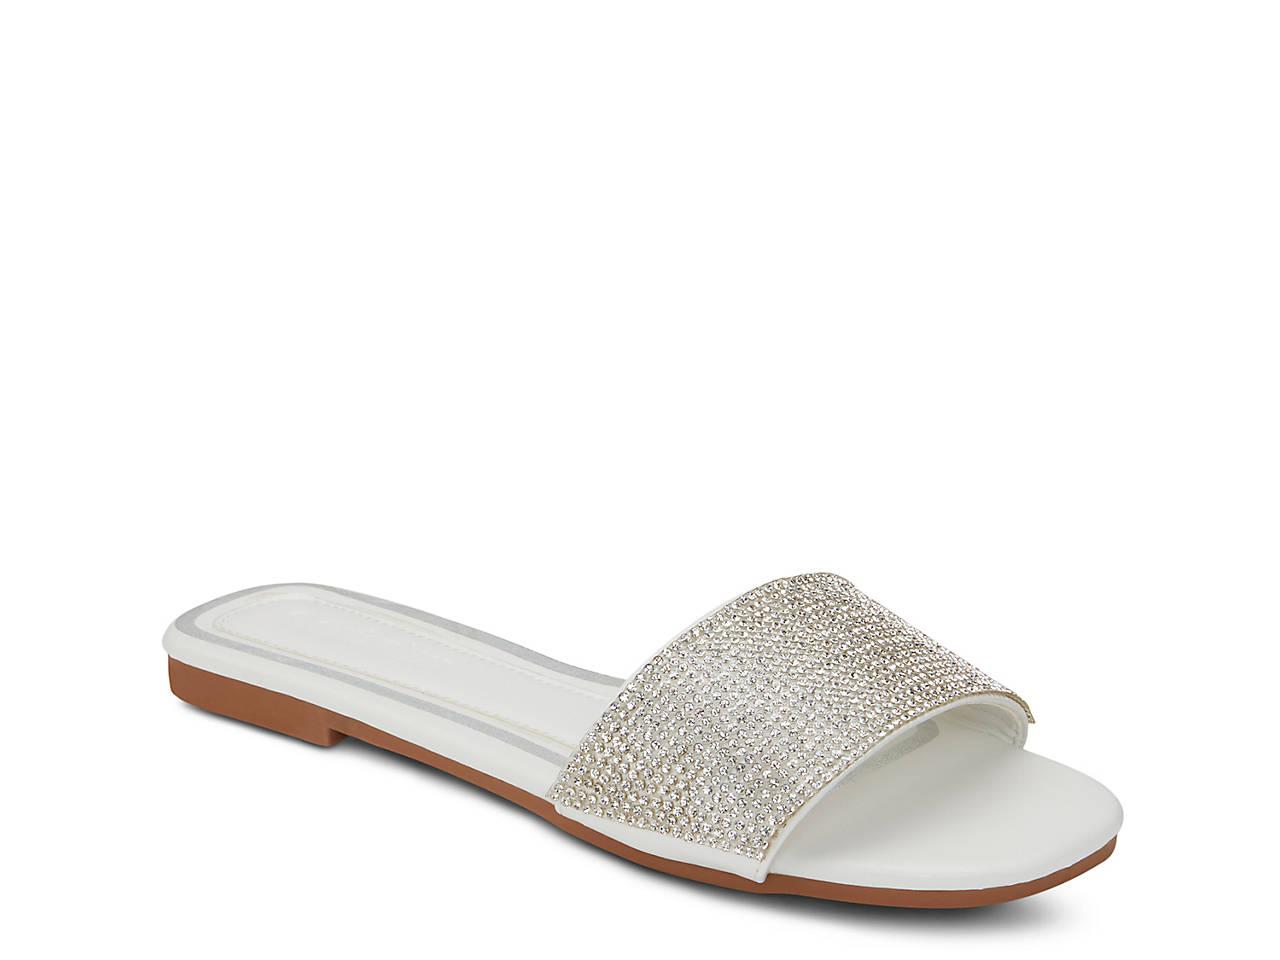 41babd59188 Olivia Miller No Excuses Sandal Women s Shoes